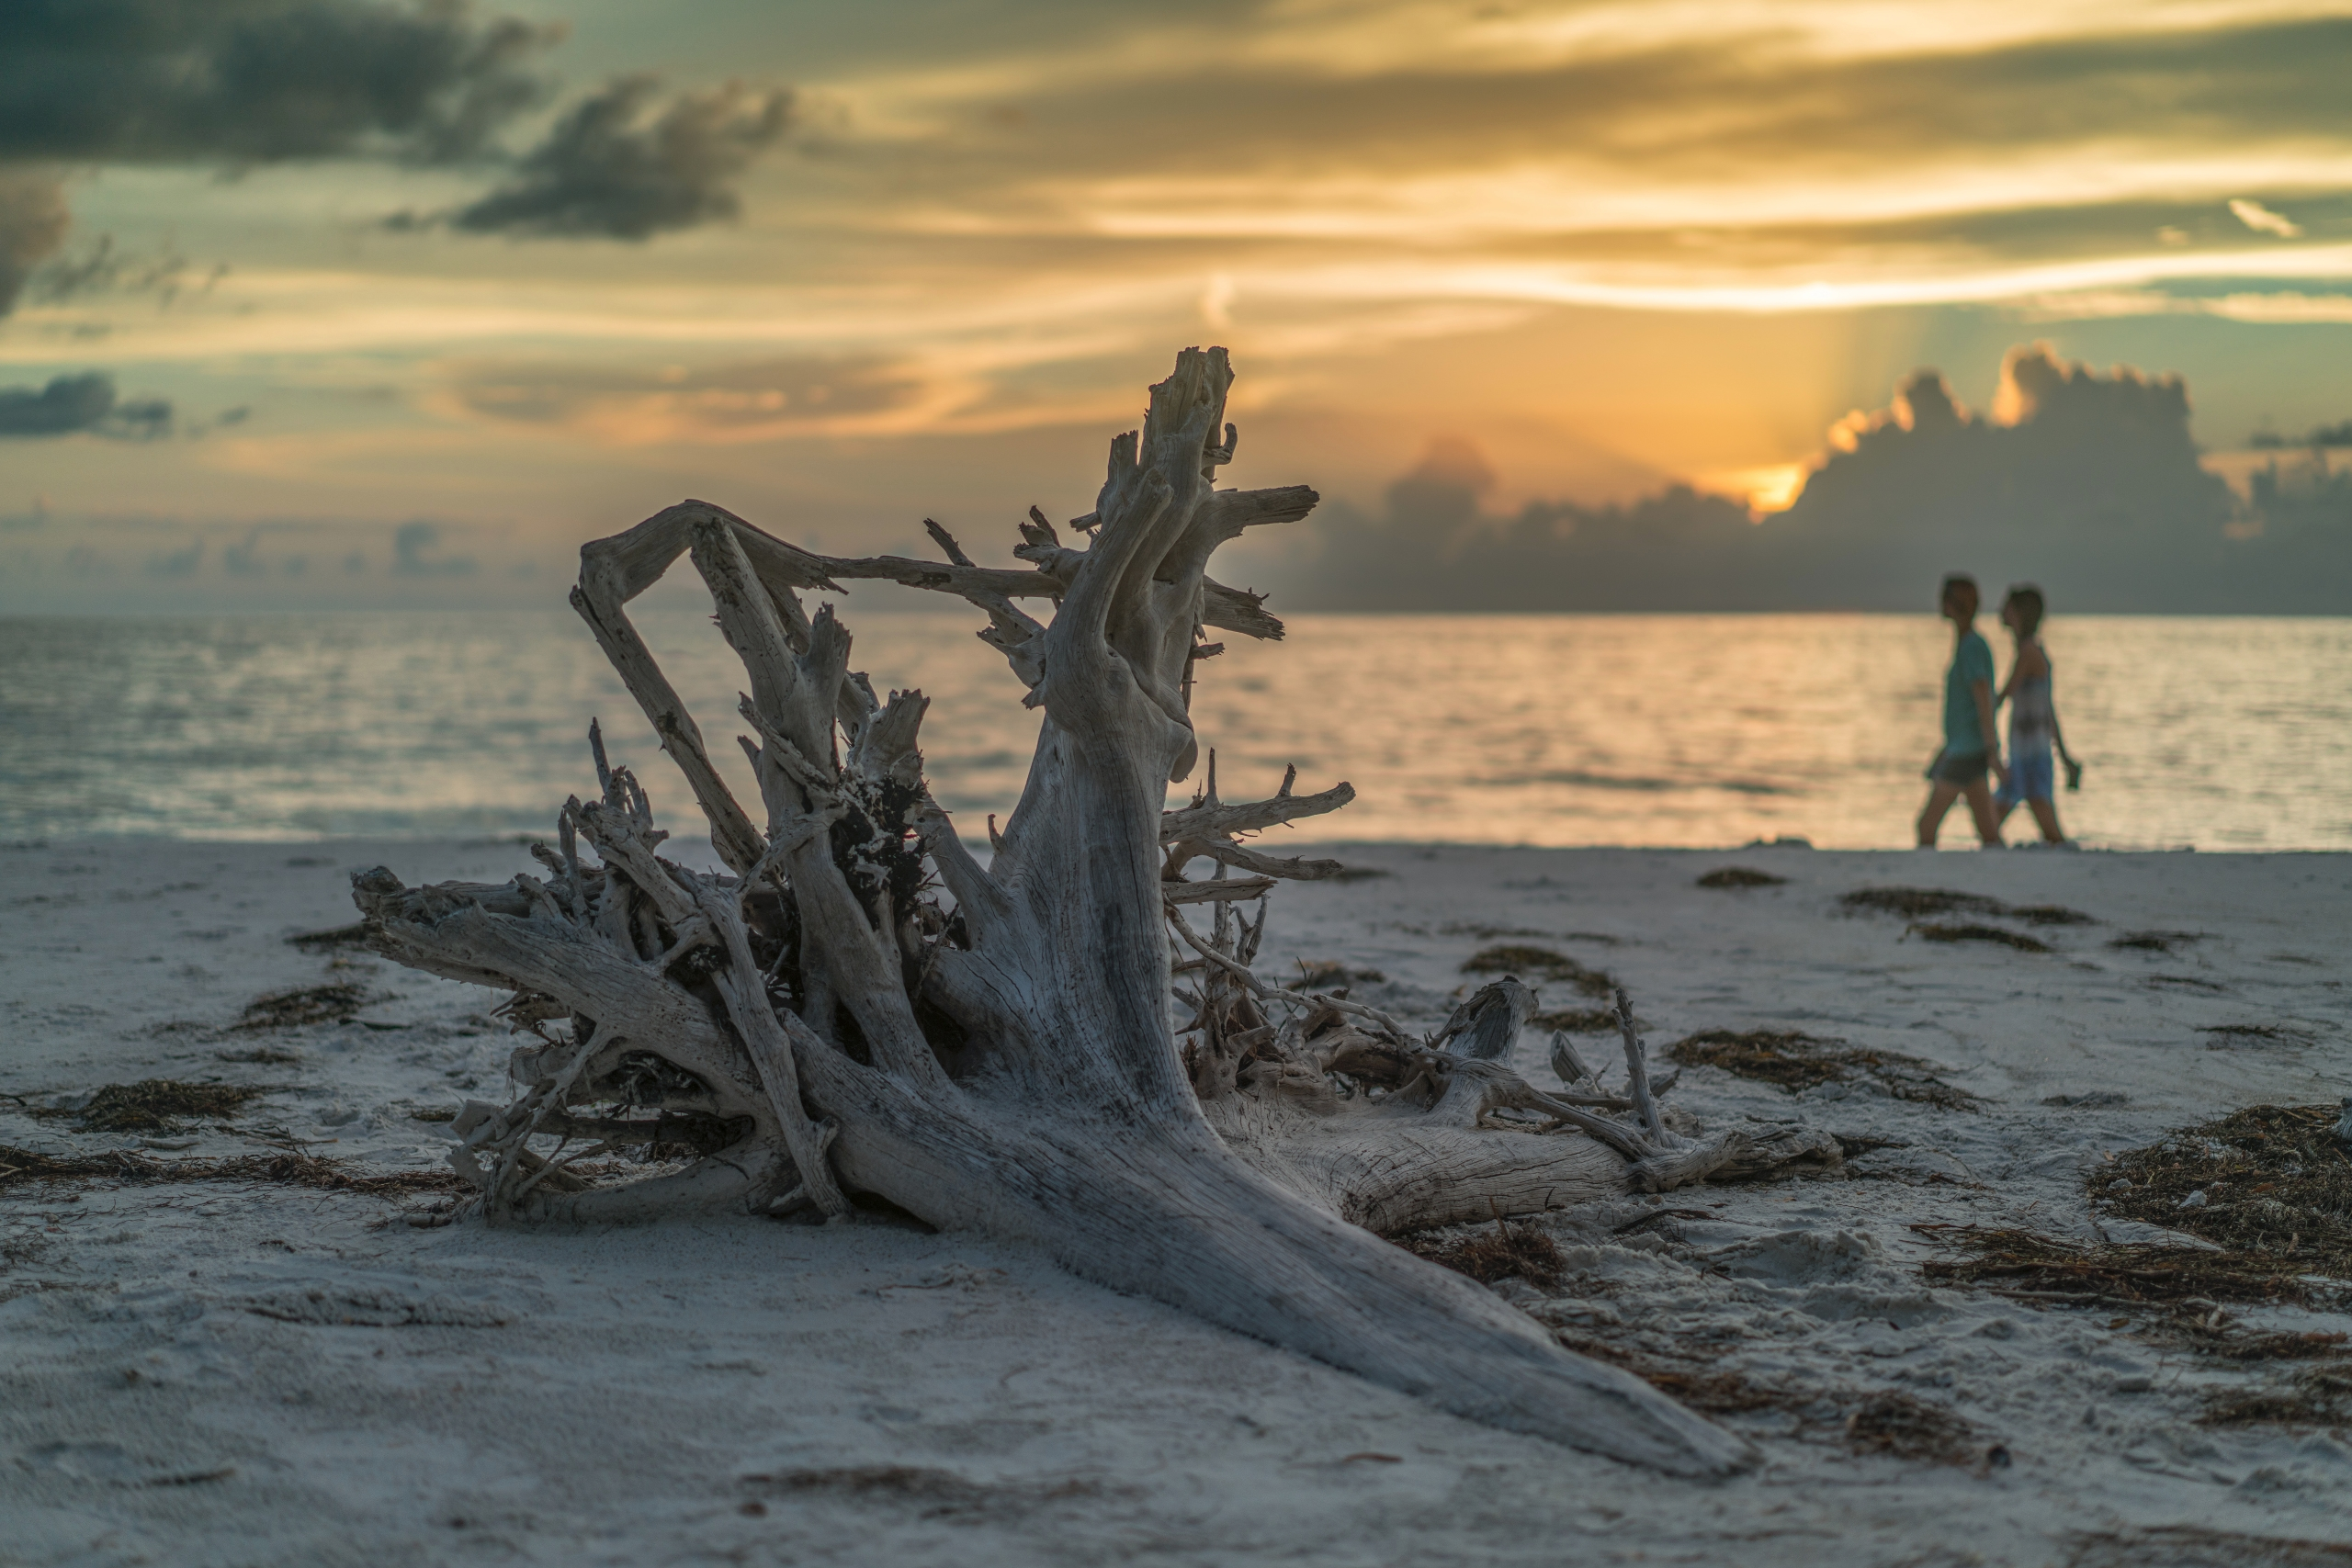 Driftwood Coast hideaway people - rickschwartz | ello